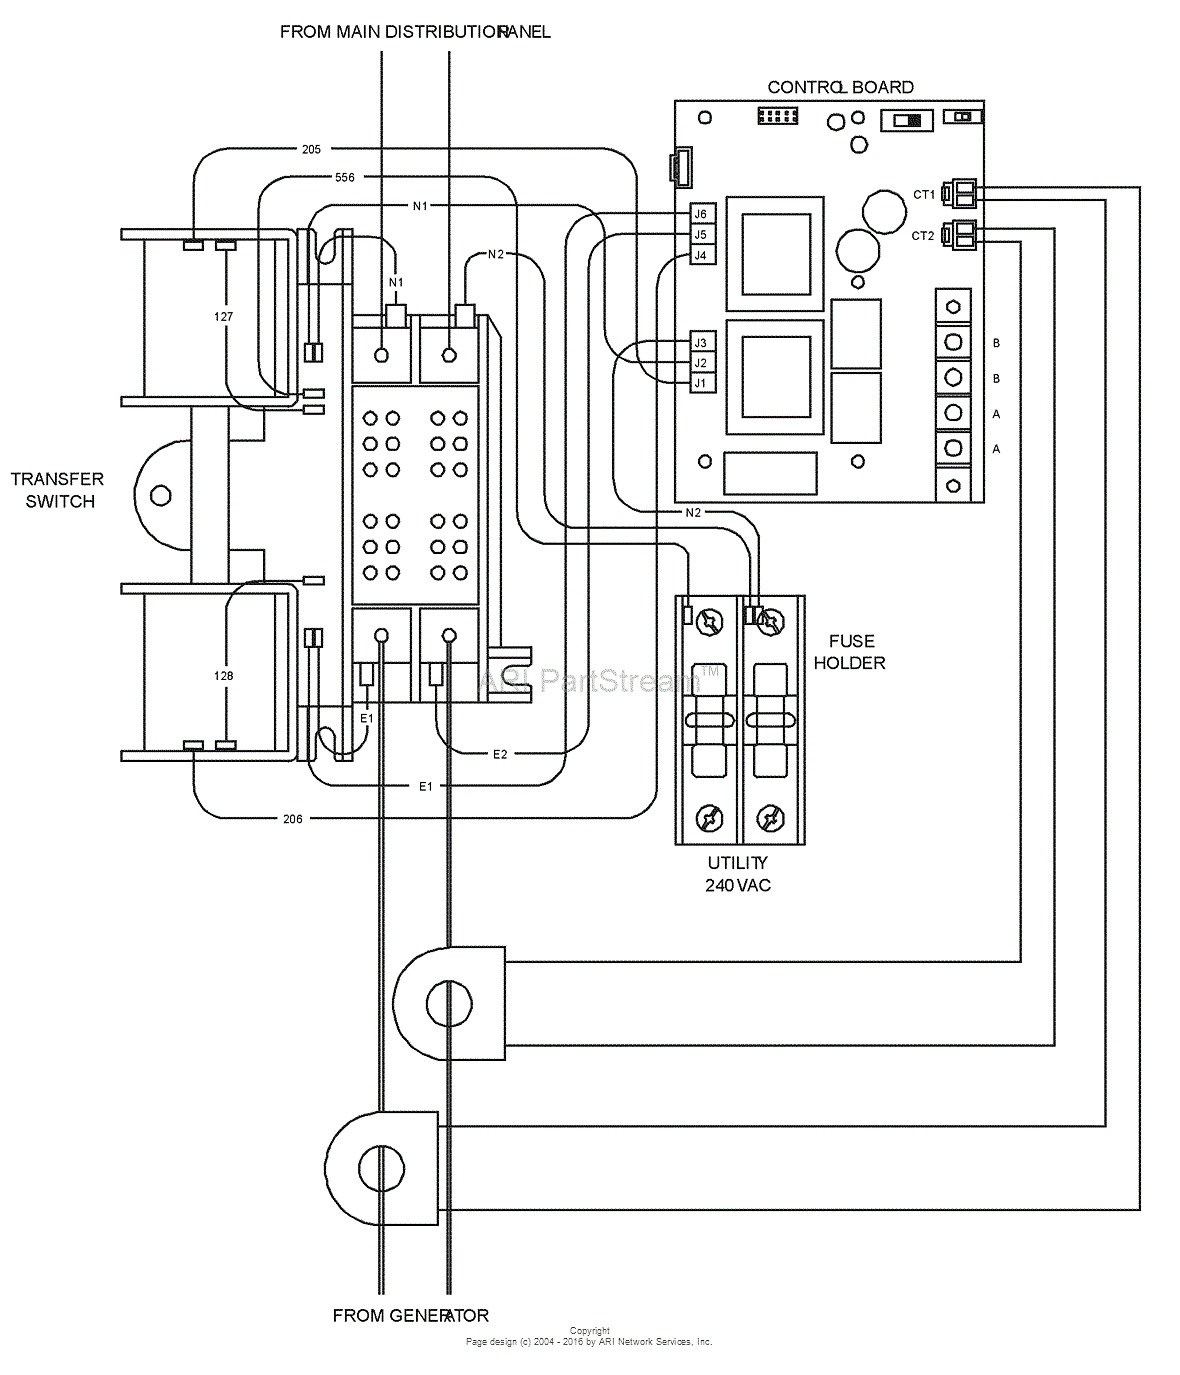 generac gts transfer switch wiring diagram Collection-Rts Transfer Switch Wiring Diagram Wiring Diagram • 6-o